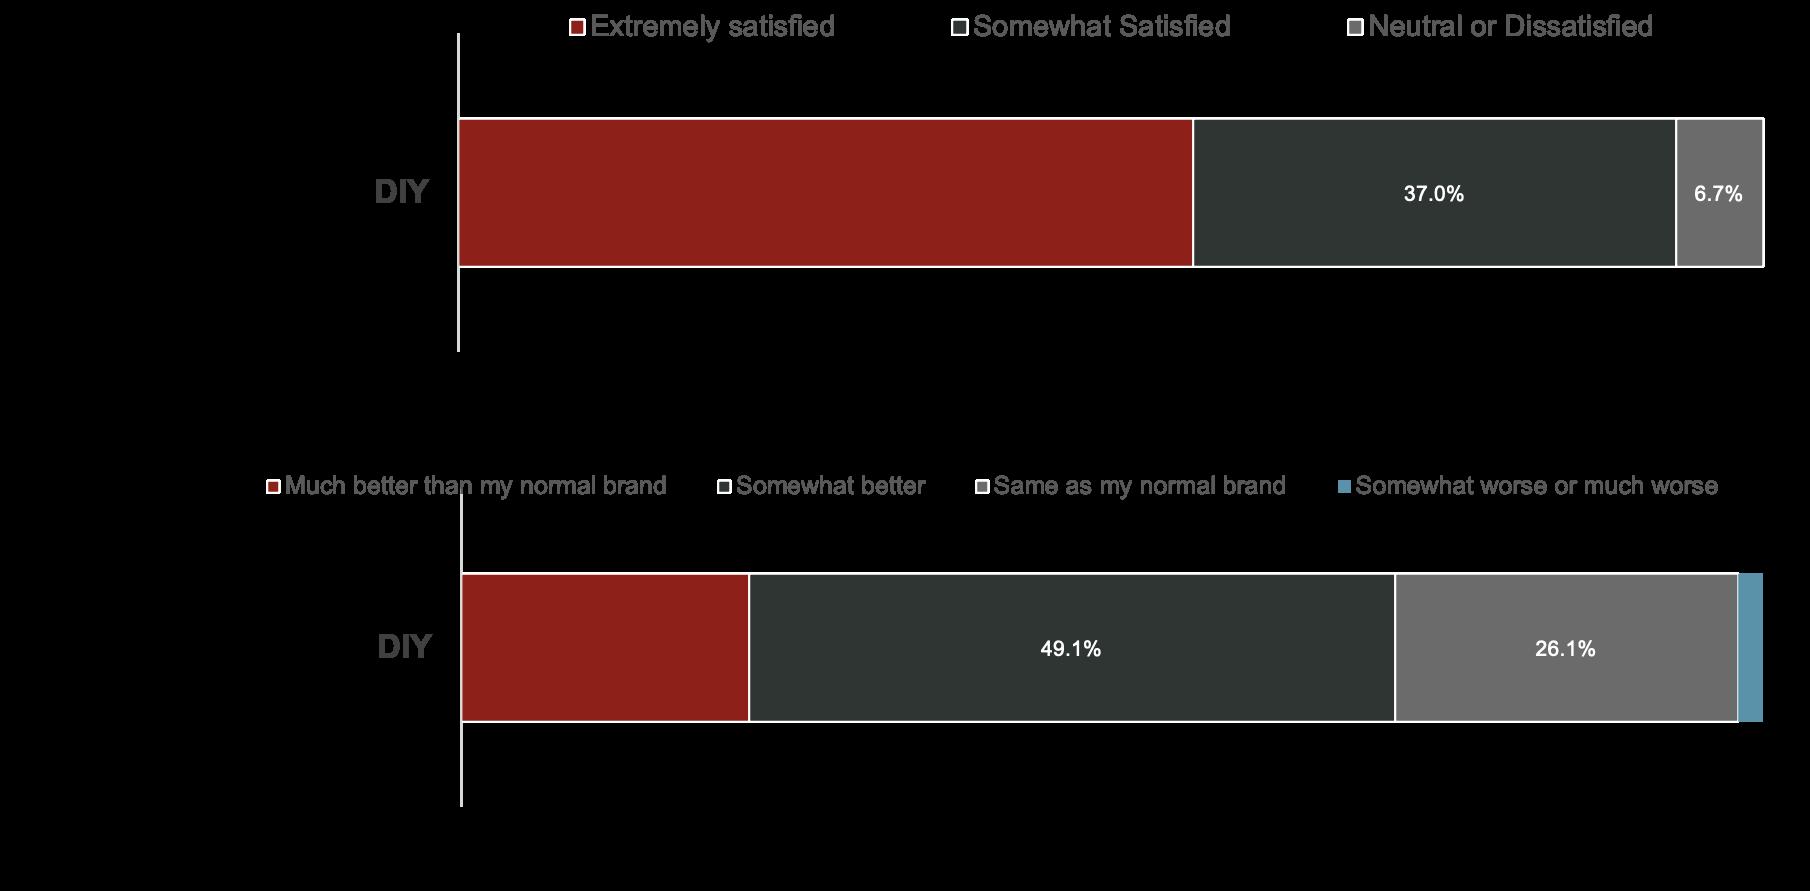 Dec 2020 - Shifting DIY Brand Behaviors - image 2.png